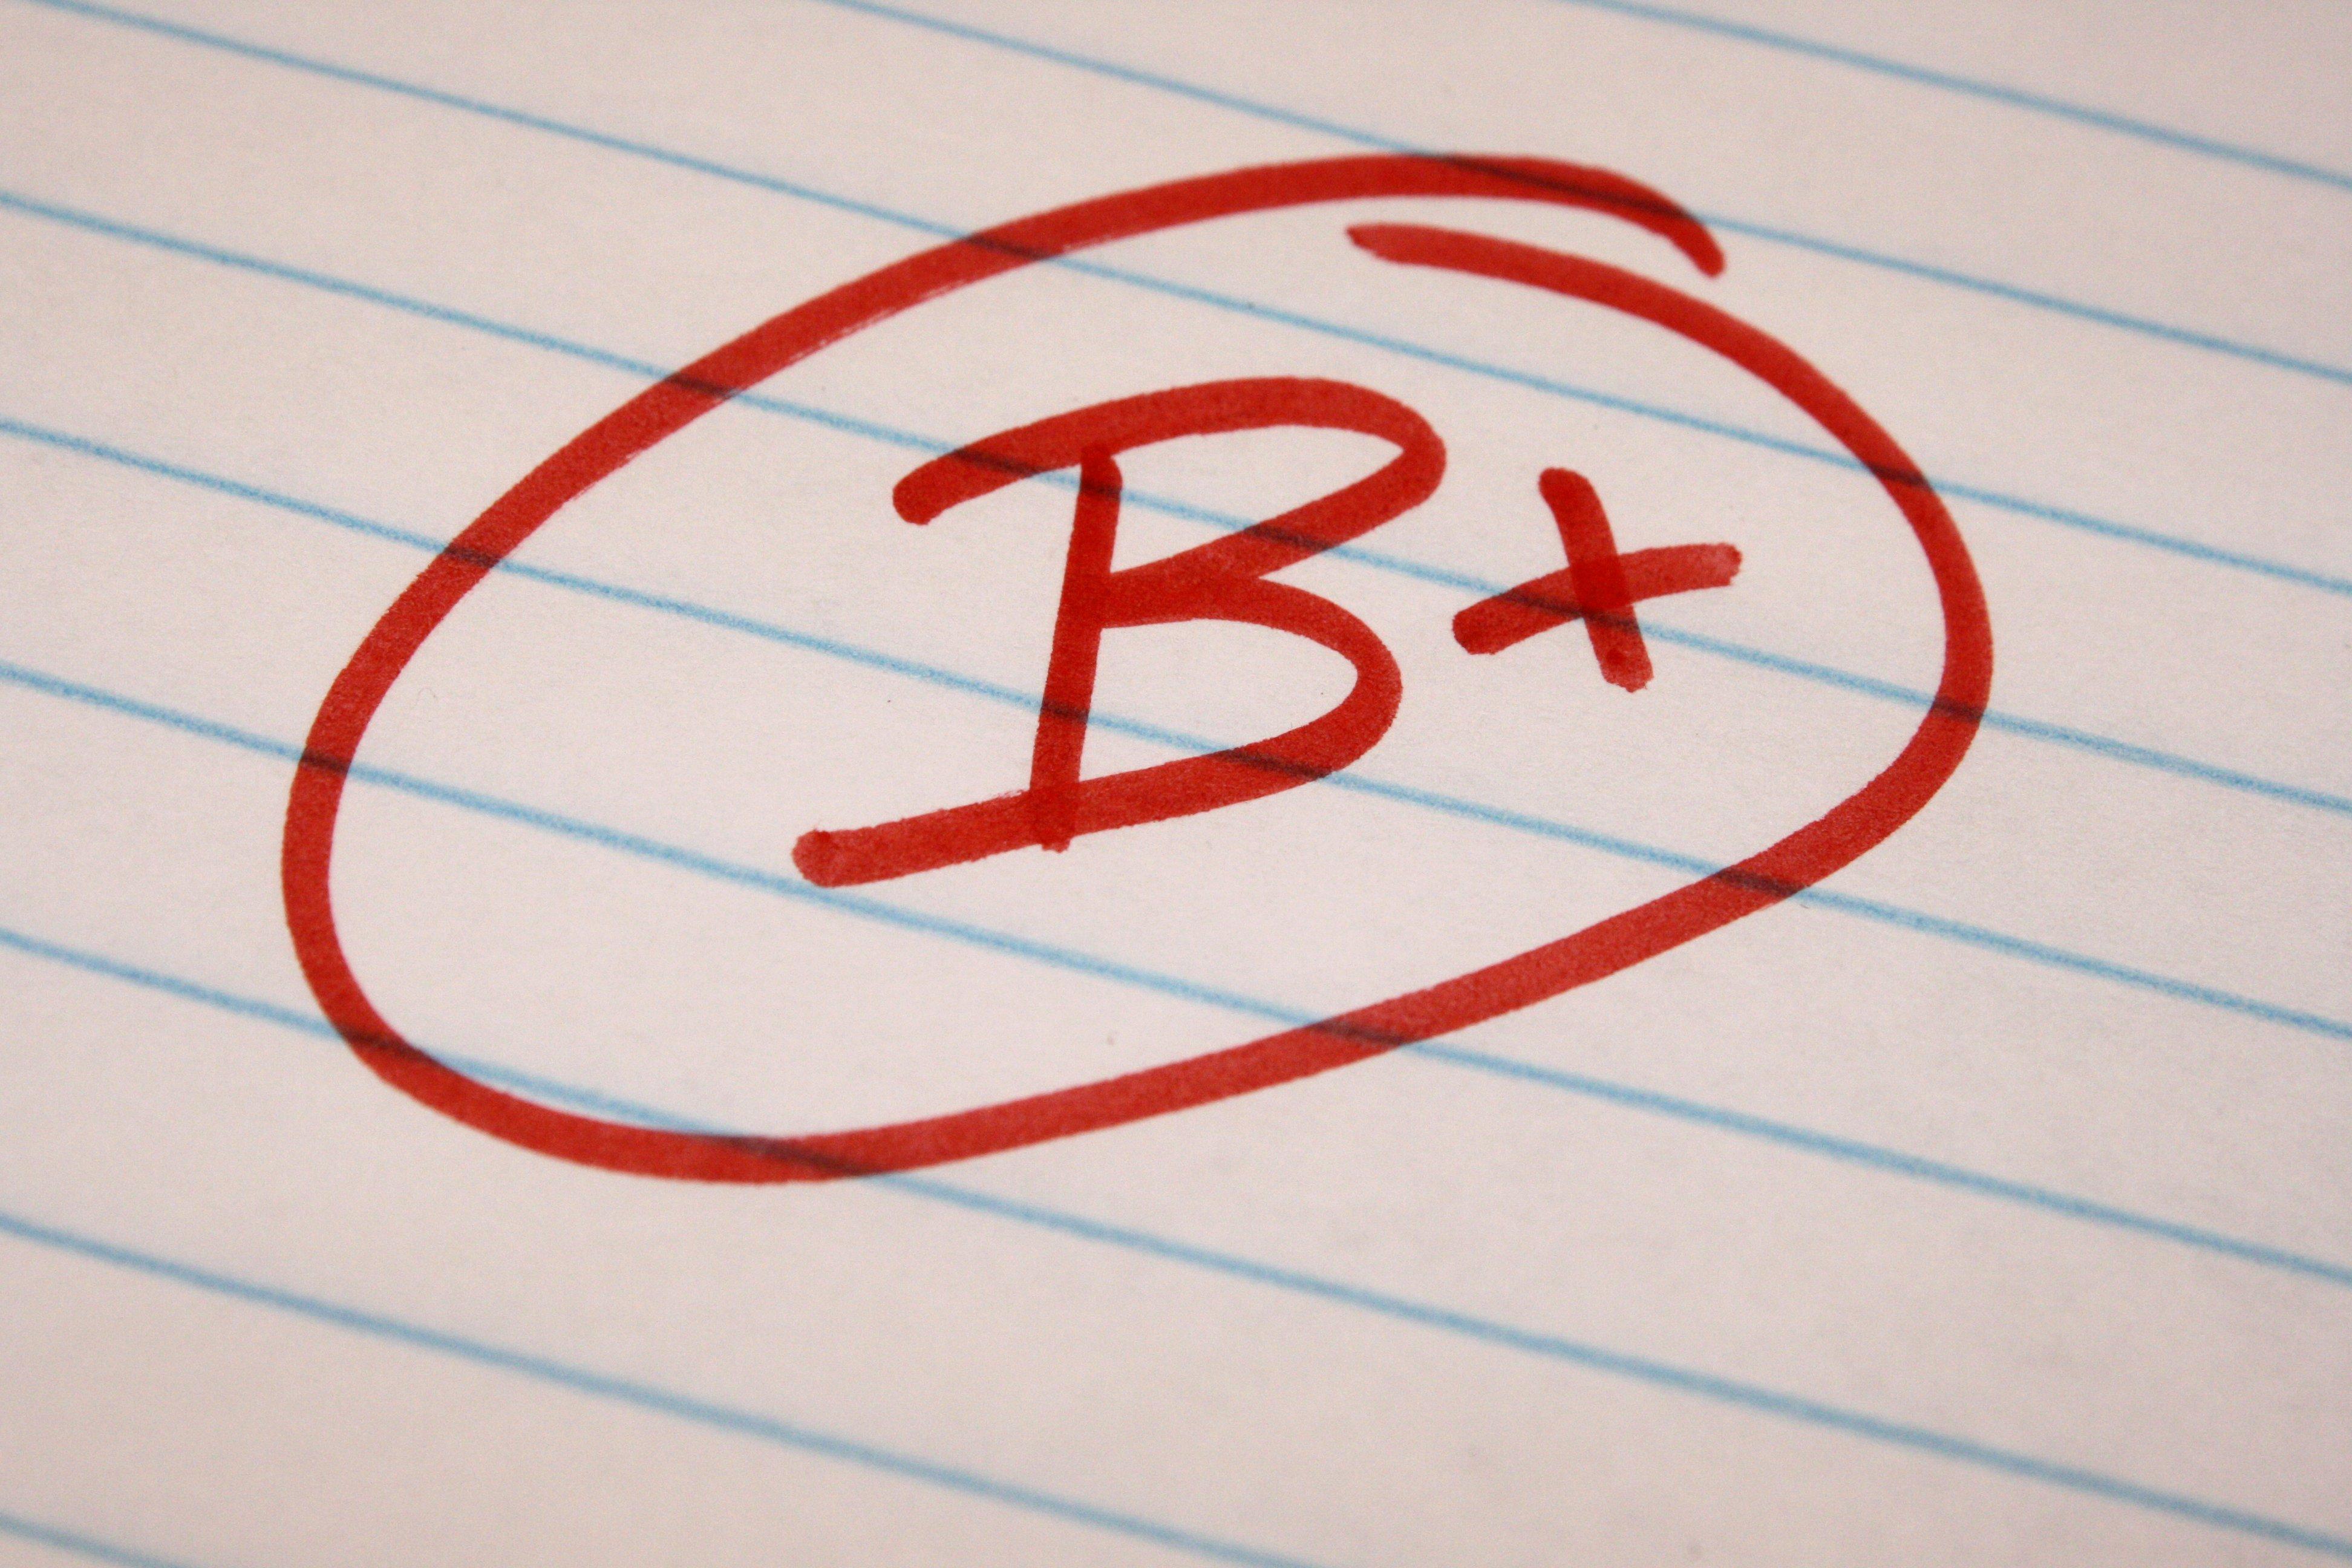 b-plus-letter-grade